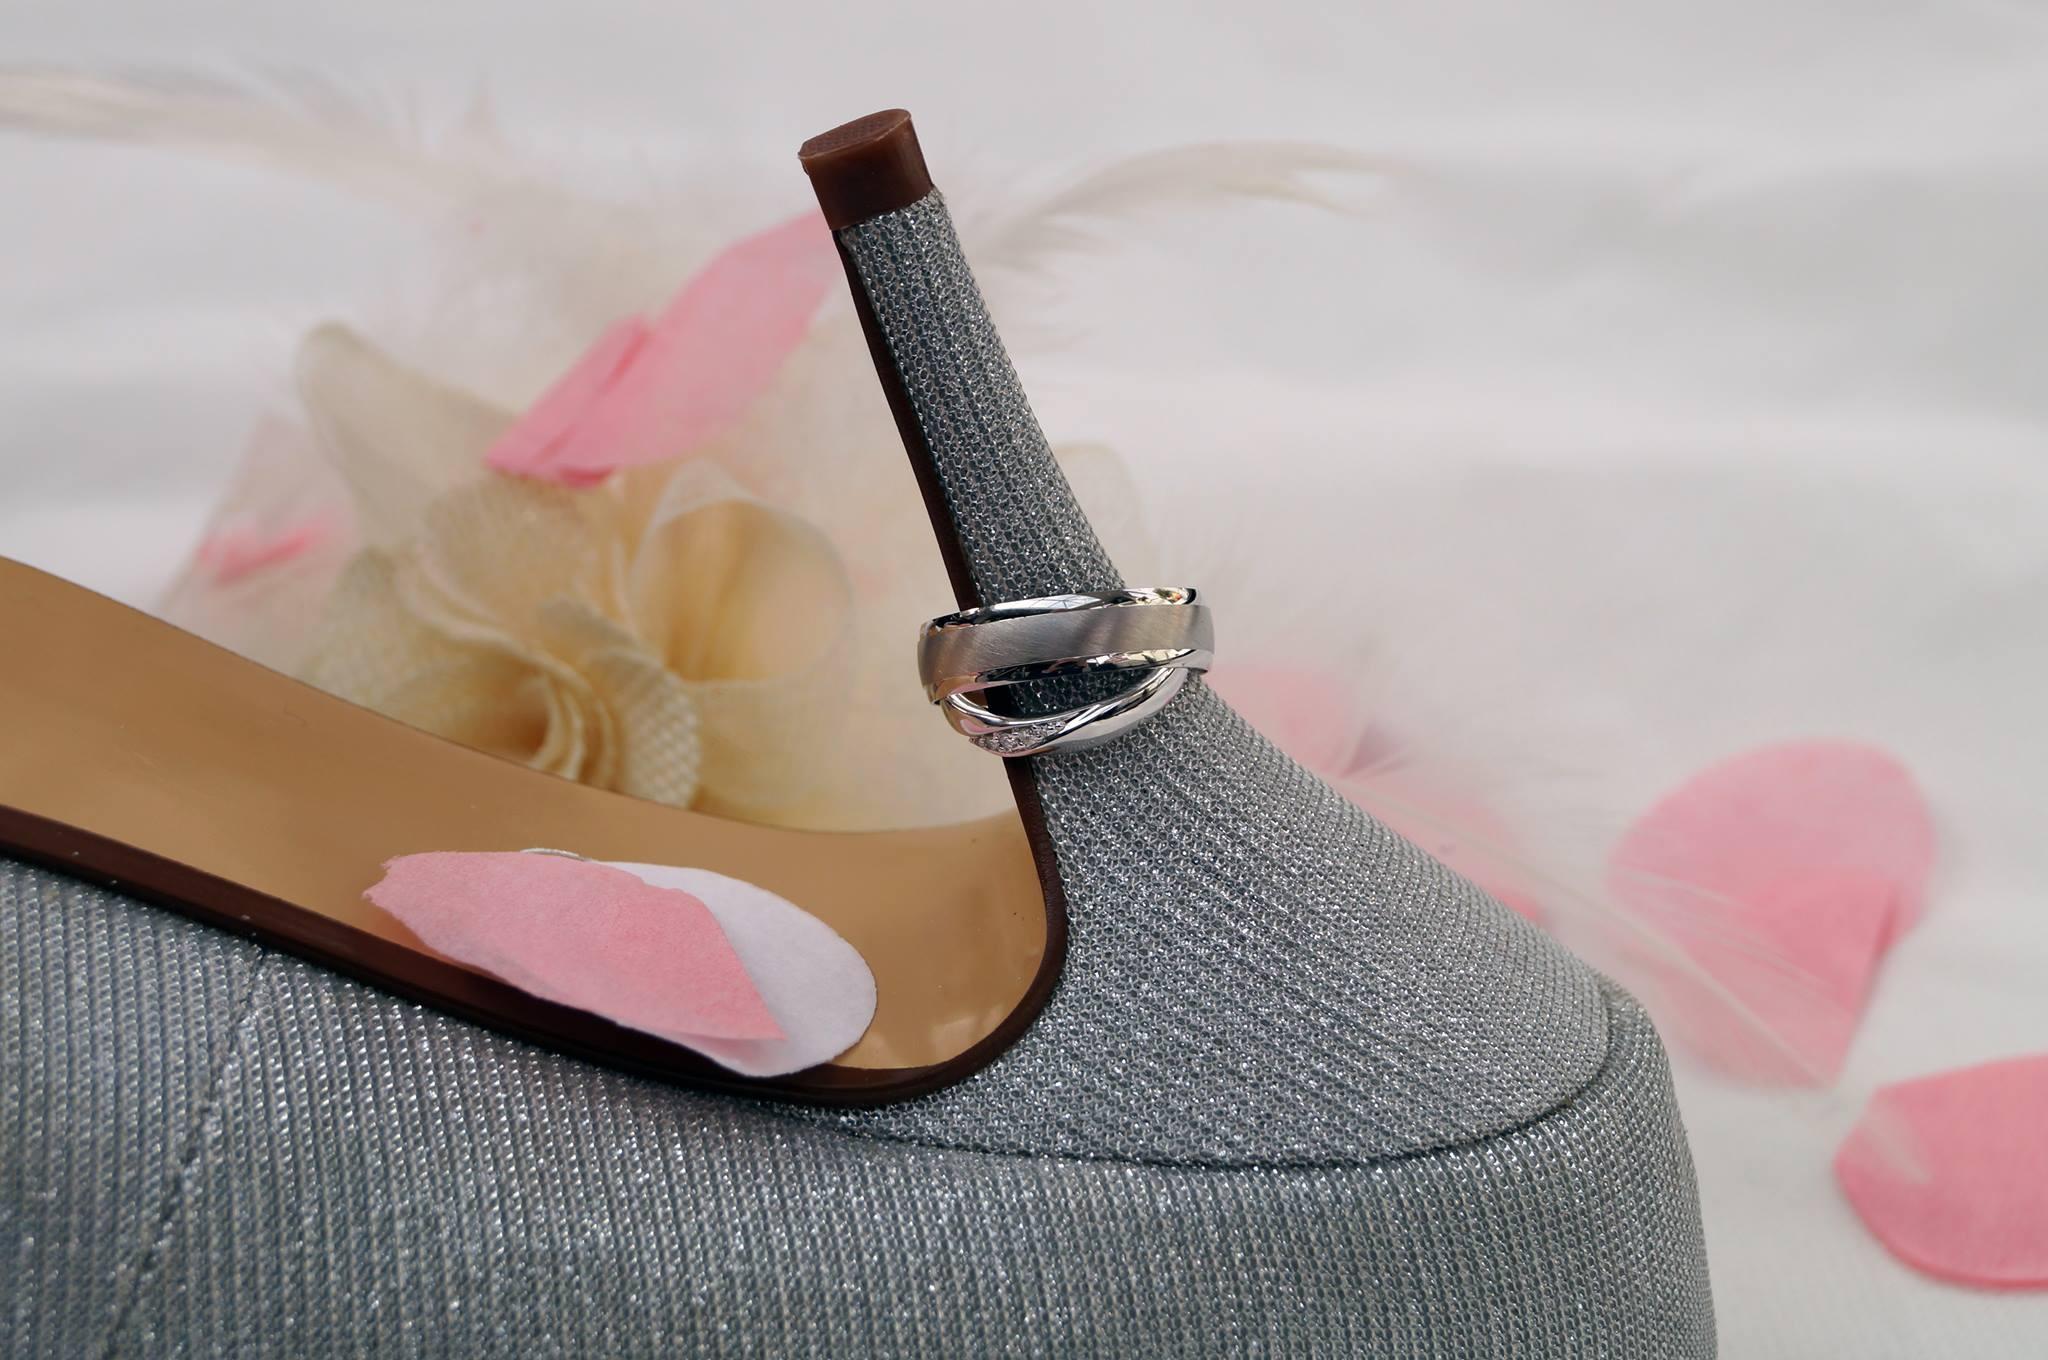 the wedding shoe by Dan Collins